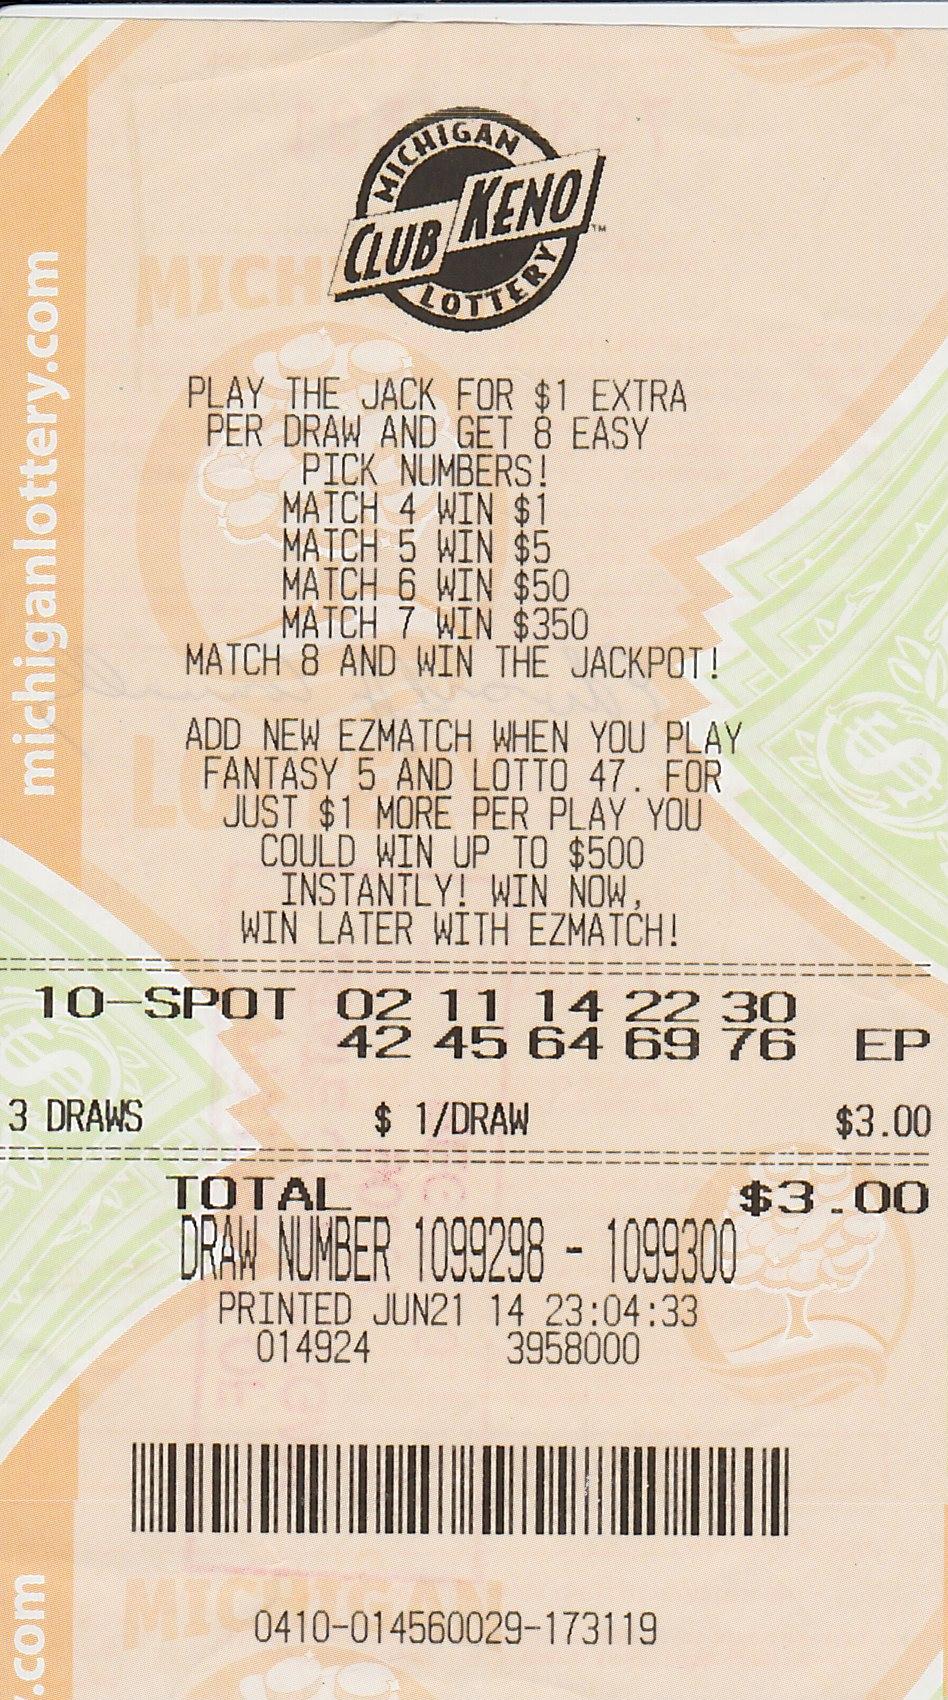 Club keno michigan lottery numbers